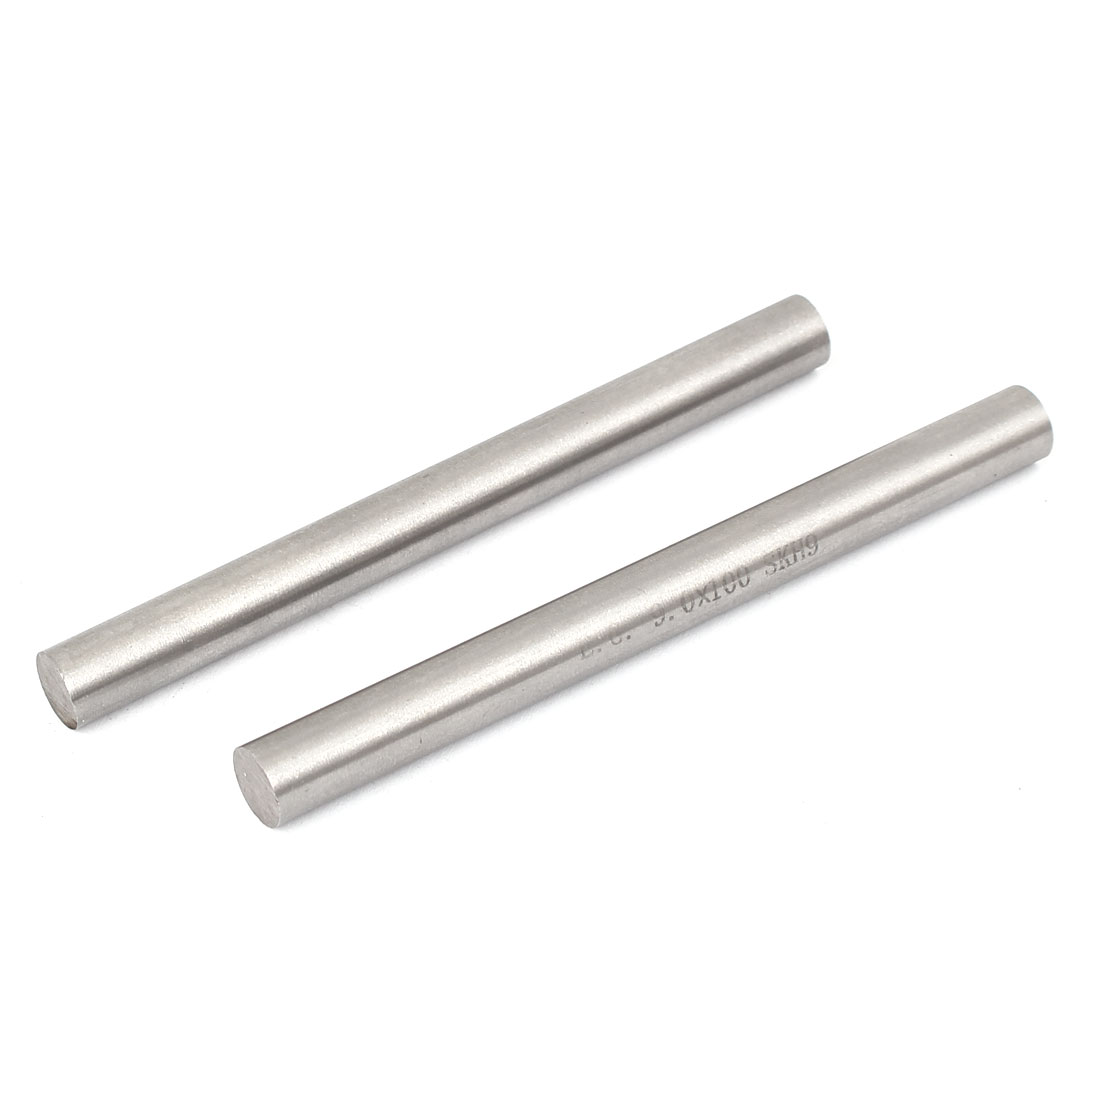 9mm x 100mm Metal Machine Turning Tools Rod Bar Lathe Round Stick 2pcs